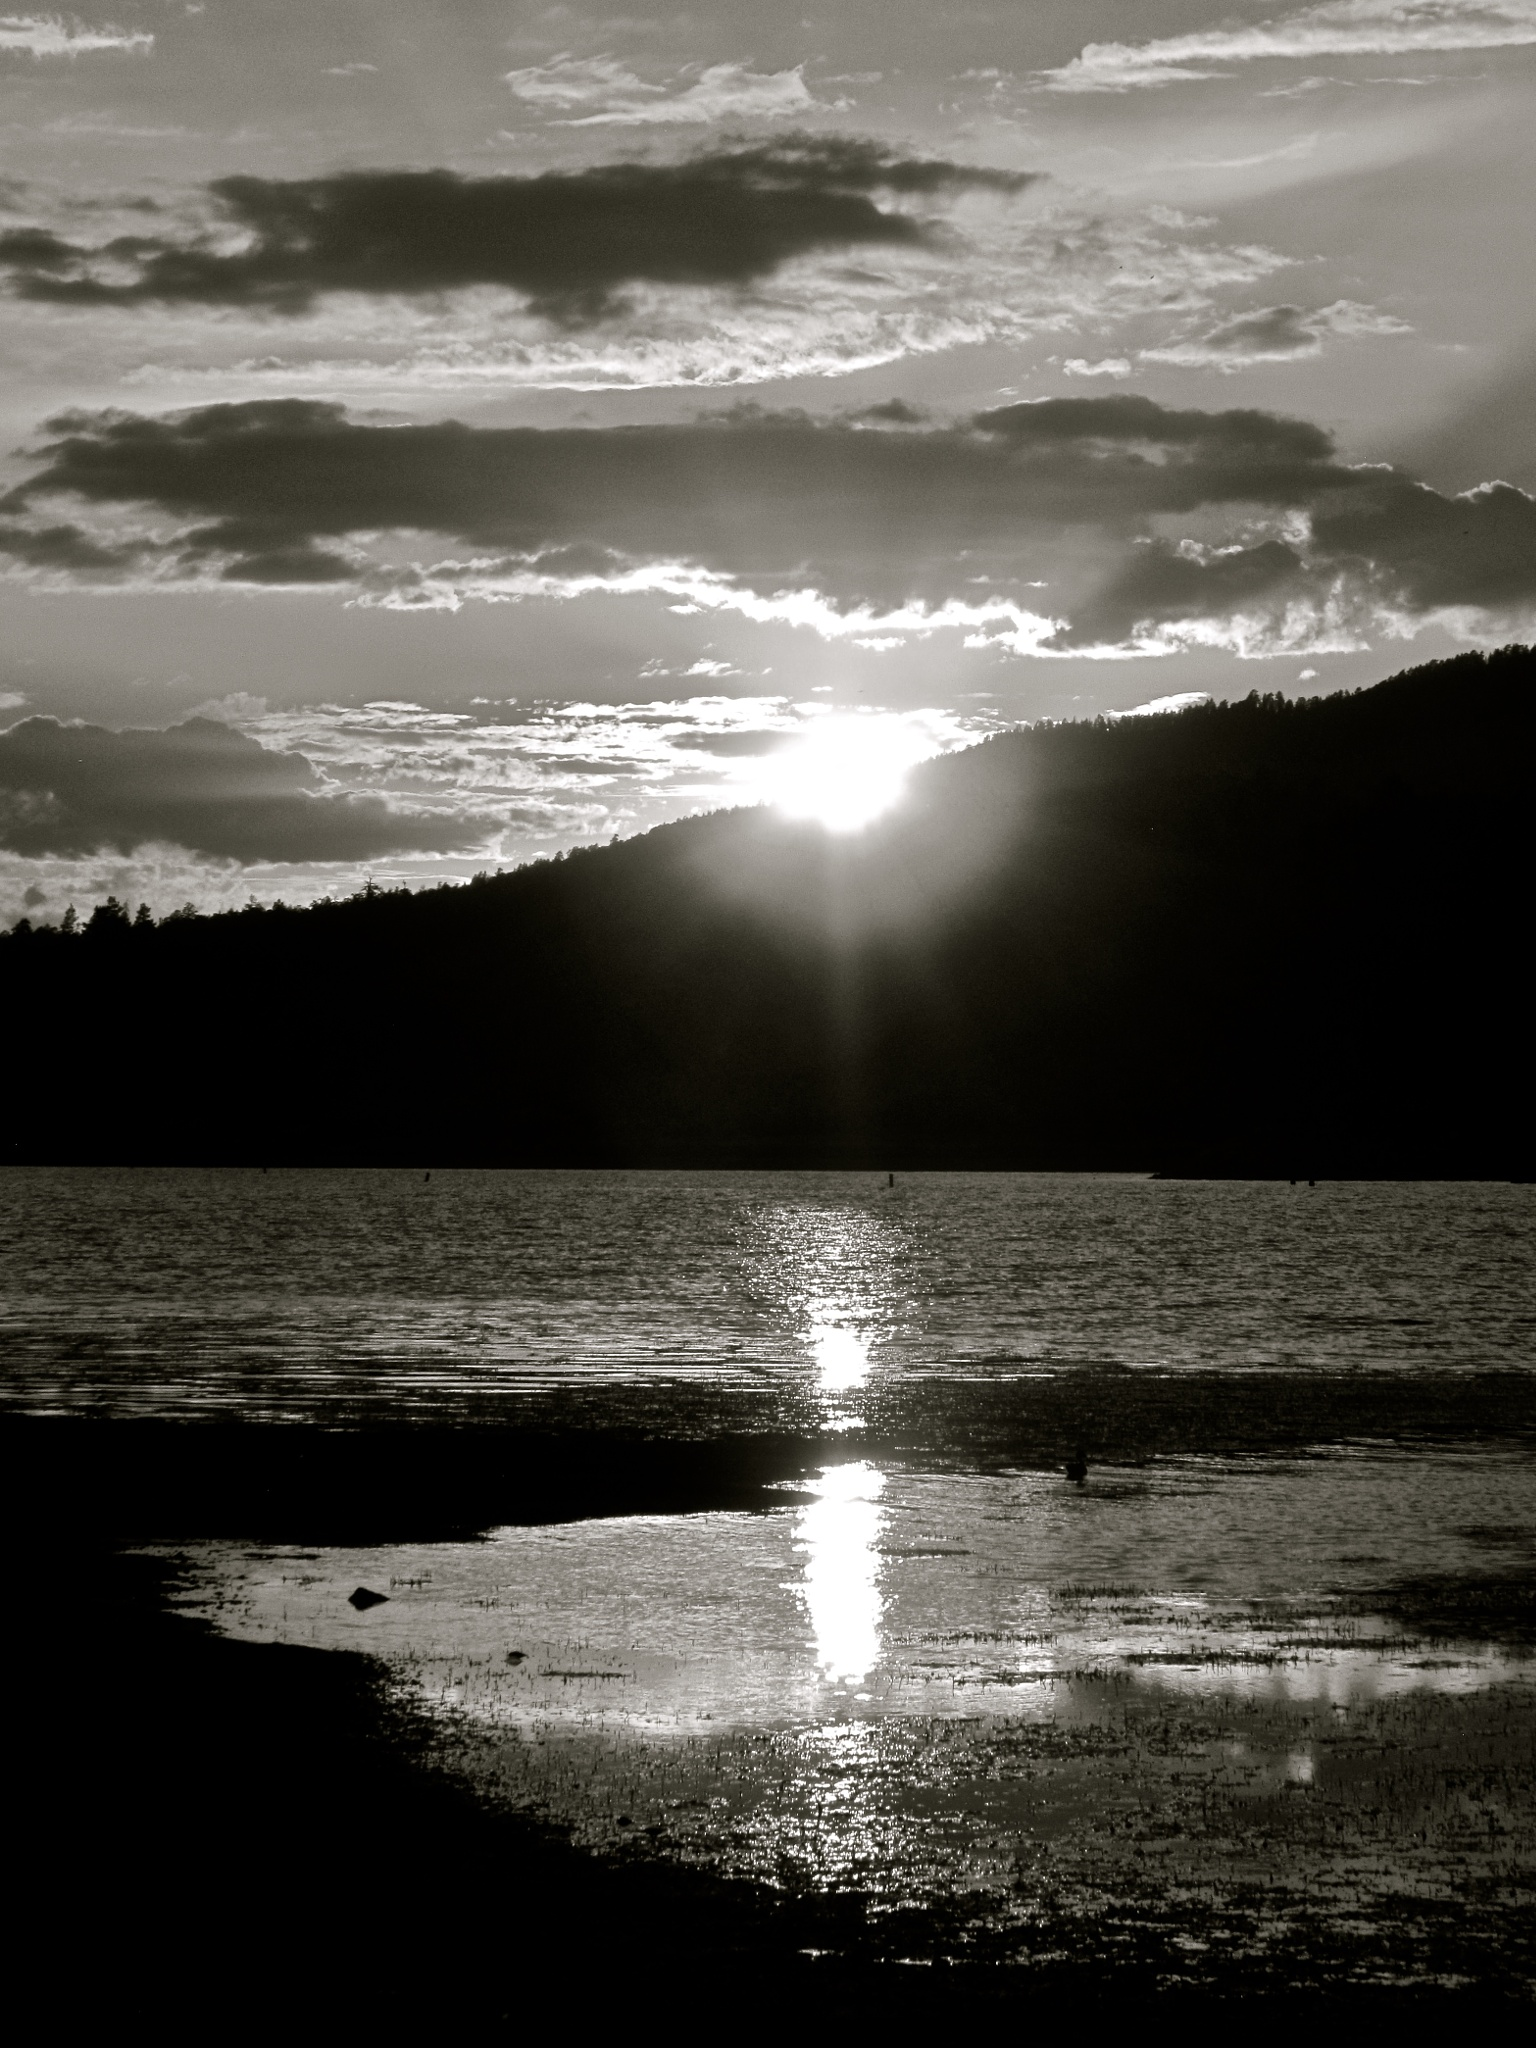 Sunset on Big Bear Lake 6:40:47 PM by MelanieAnnePhillips